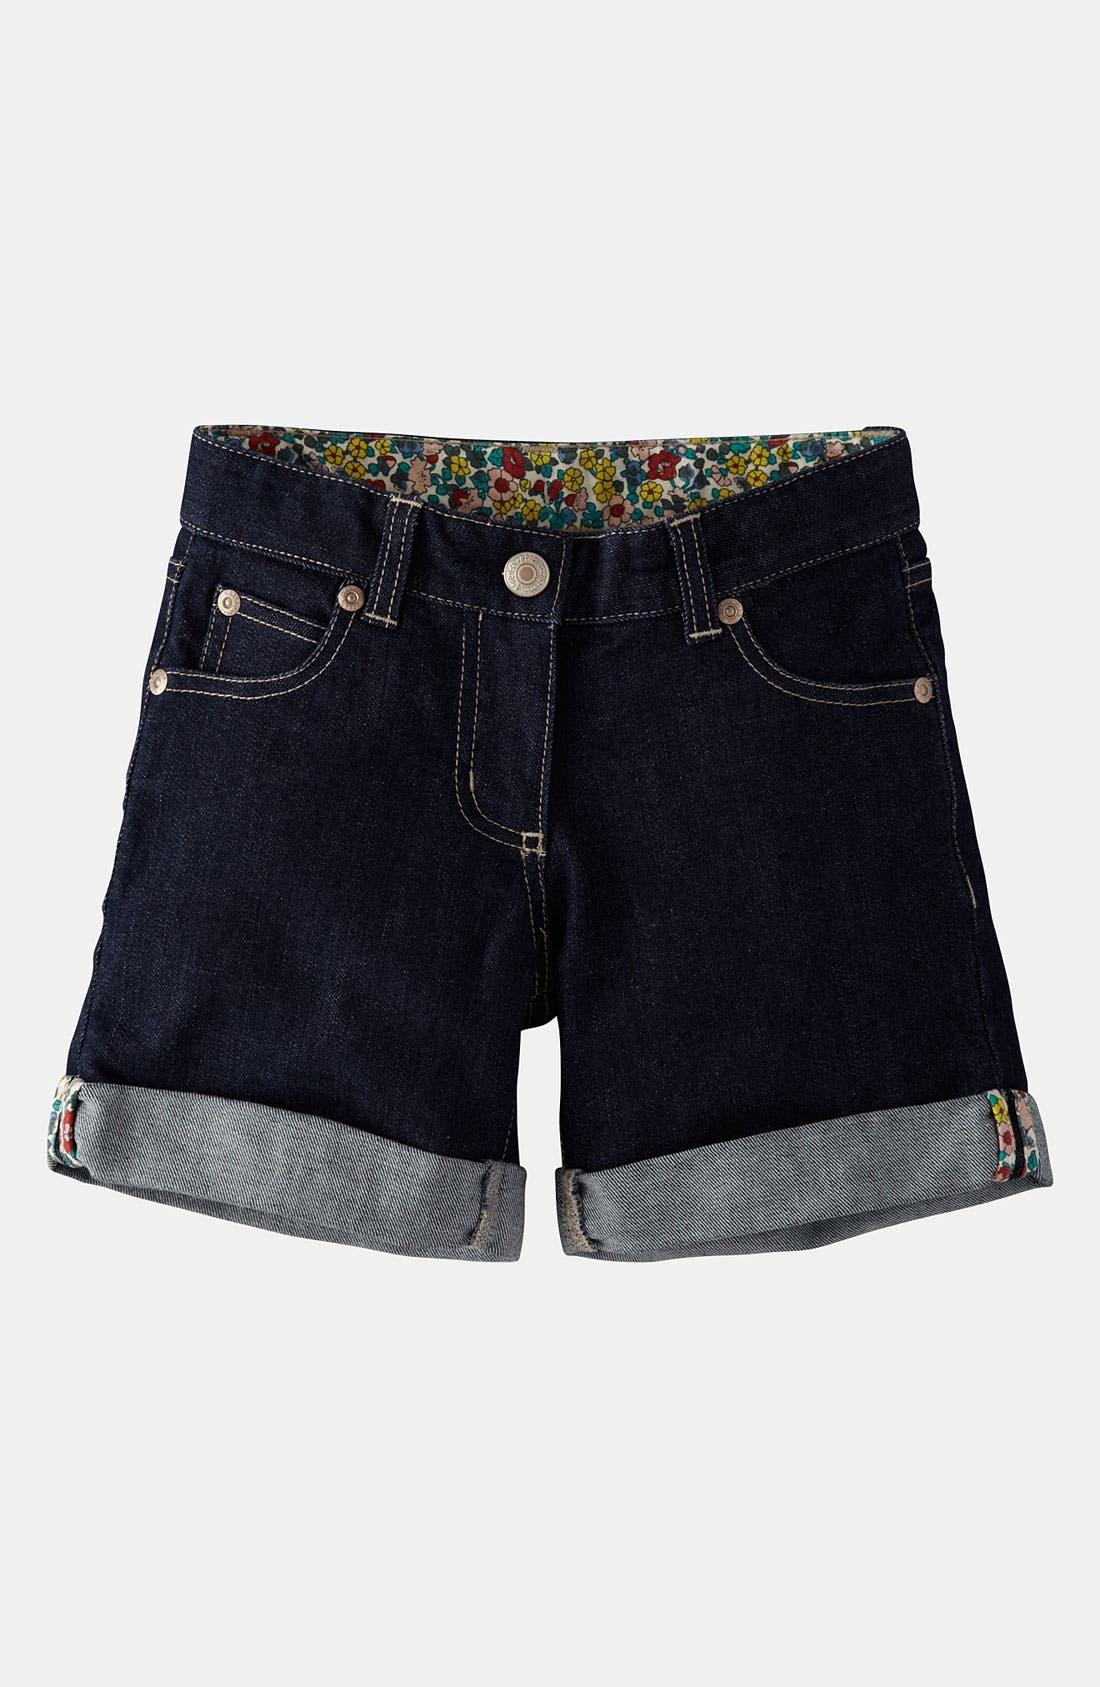 Main Image - Mini Boden 'Roll Up' Shorts (Little Girls & Big Girls)